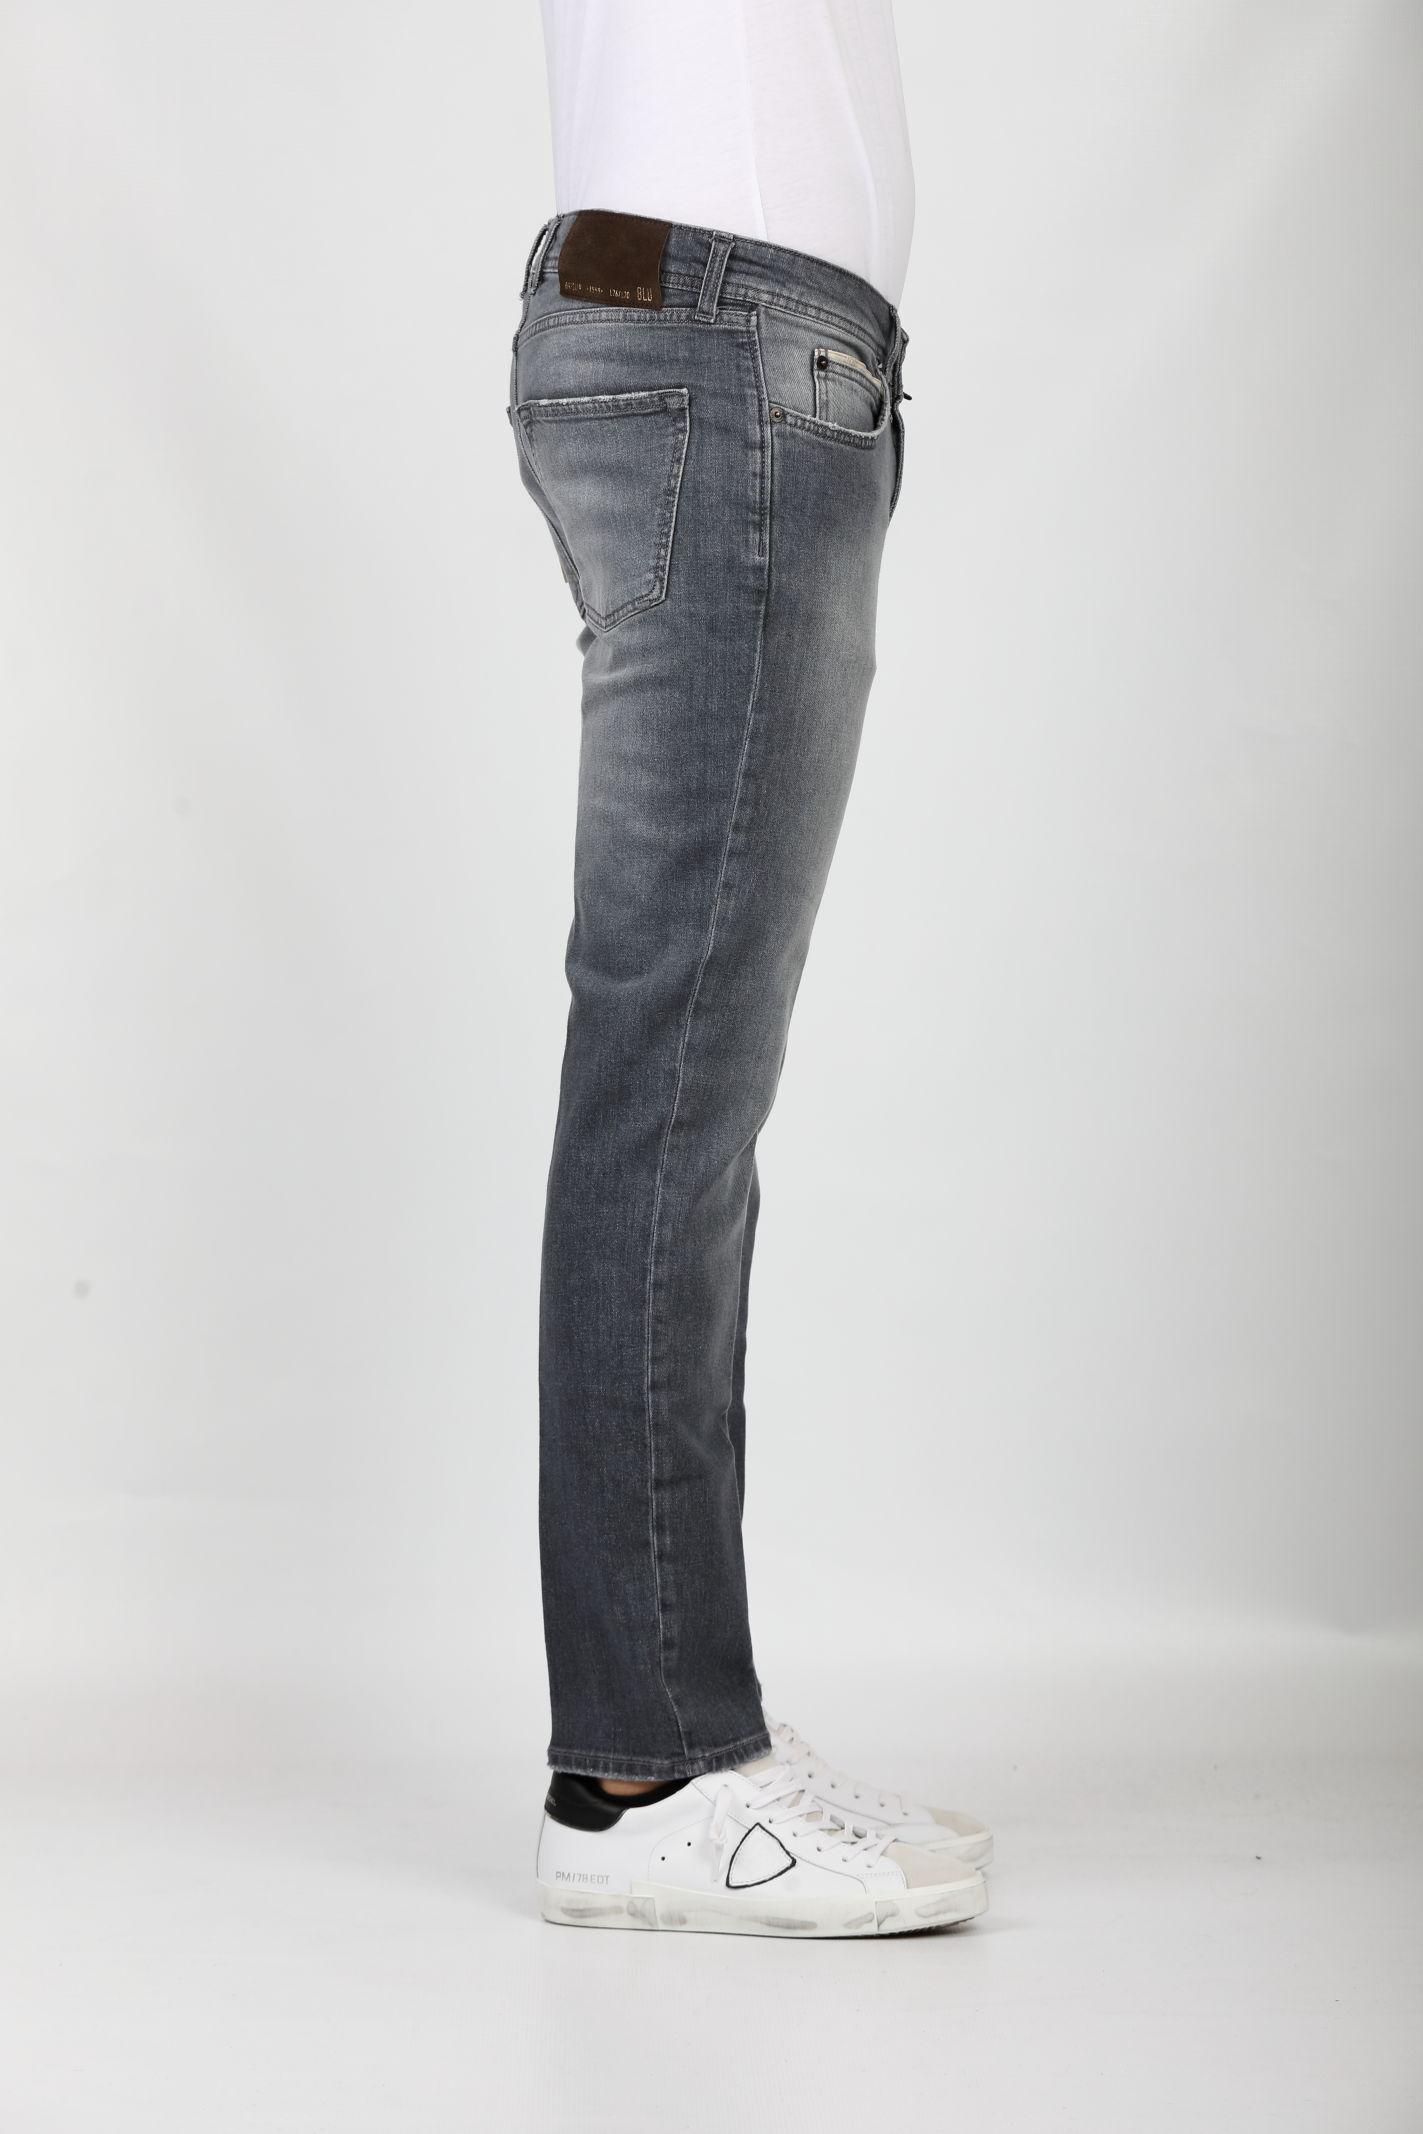 JEANS RIBOT BRIGLIA   Jeans   RIBOT-C-42114290